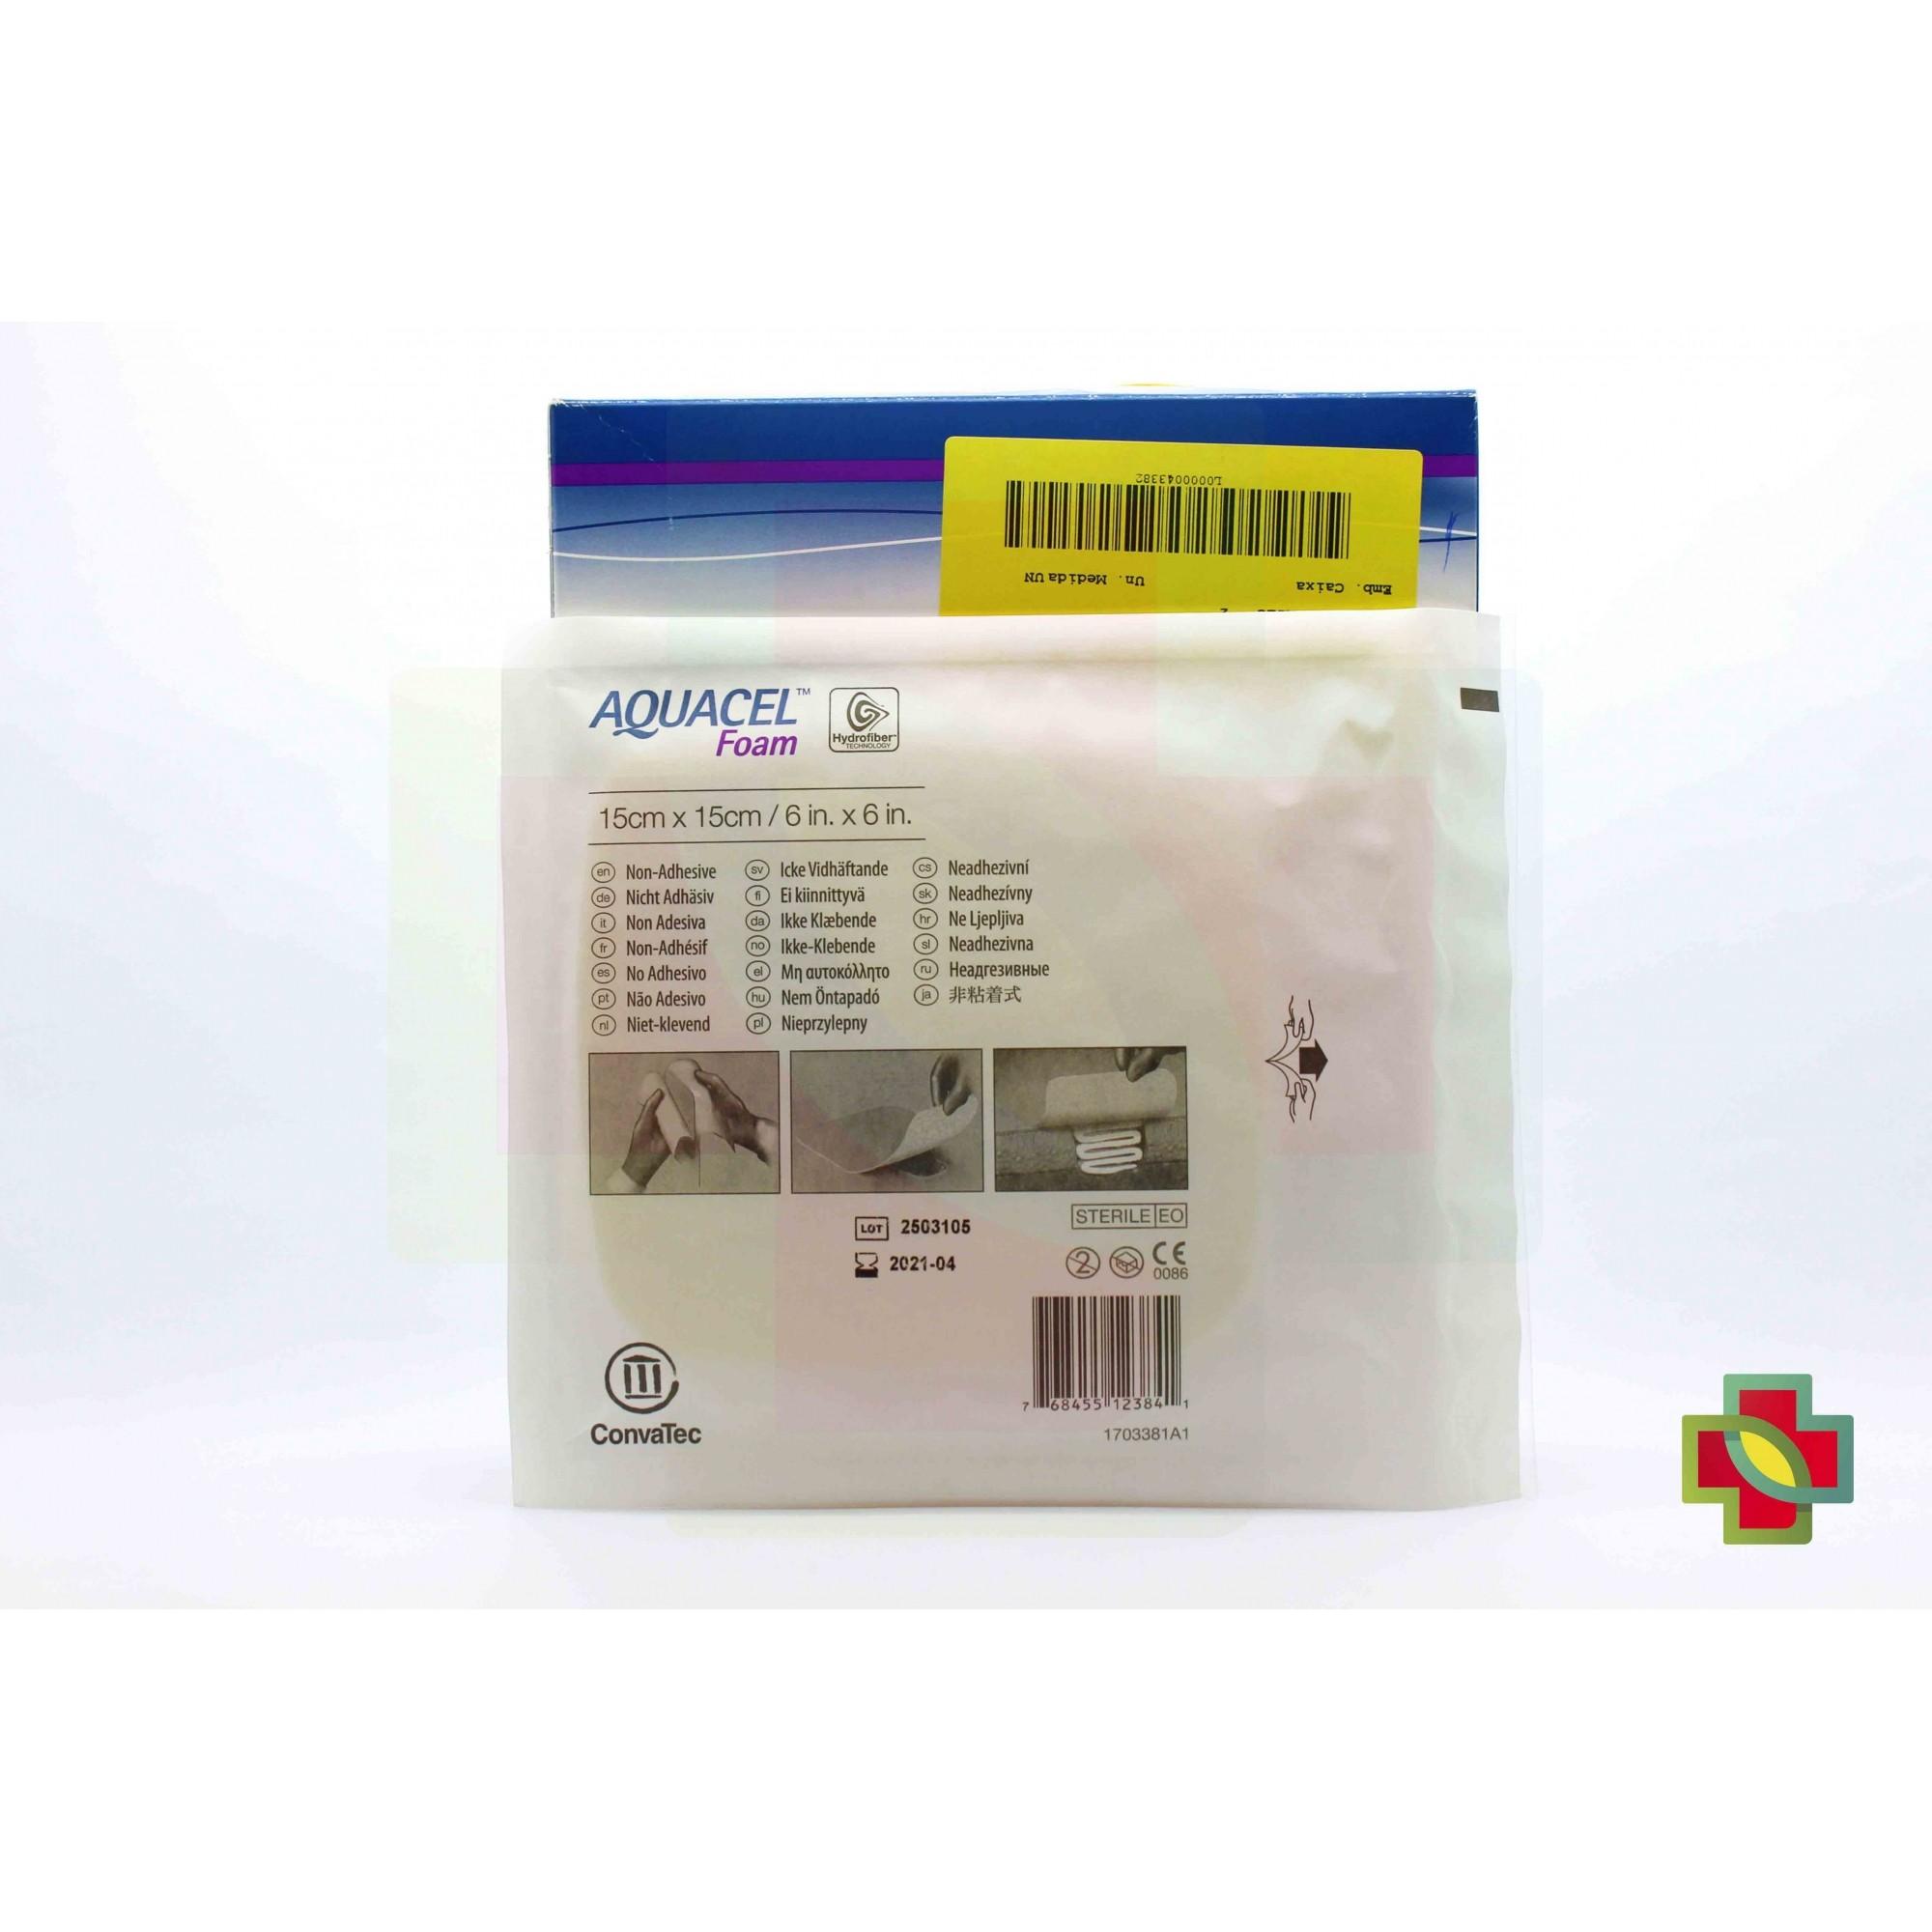 CURATIVO AQUACEL FOAM SEM ADESIVO 15 X 15 CM UND. 420635 - CONVATEC